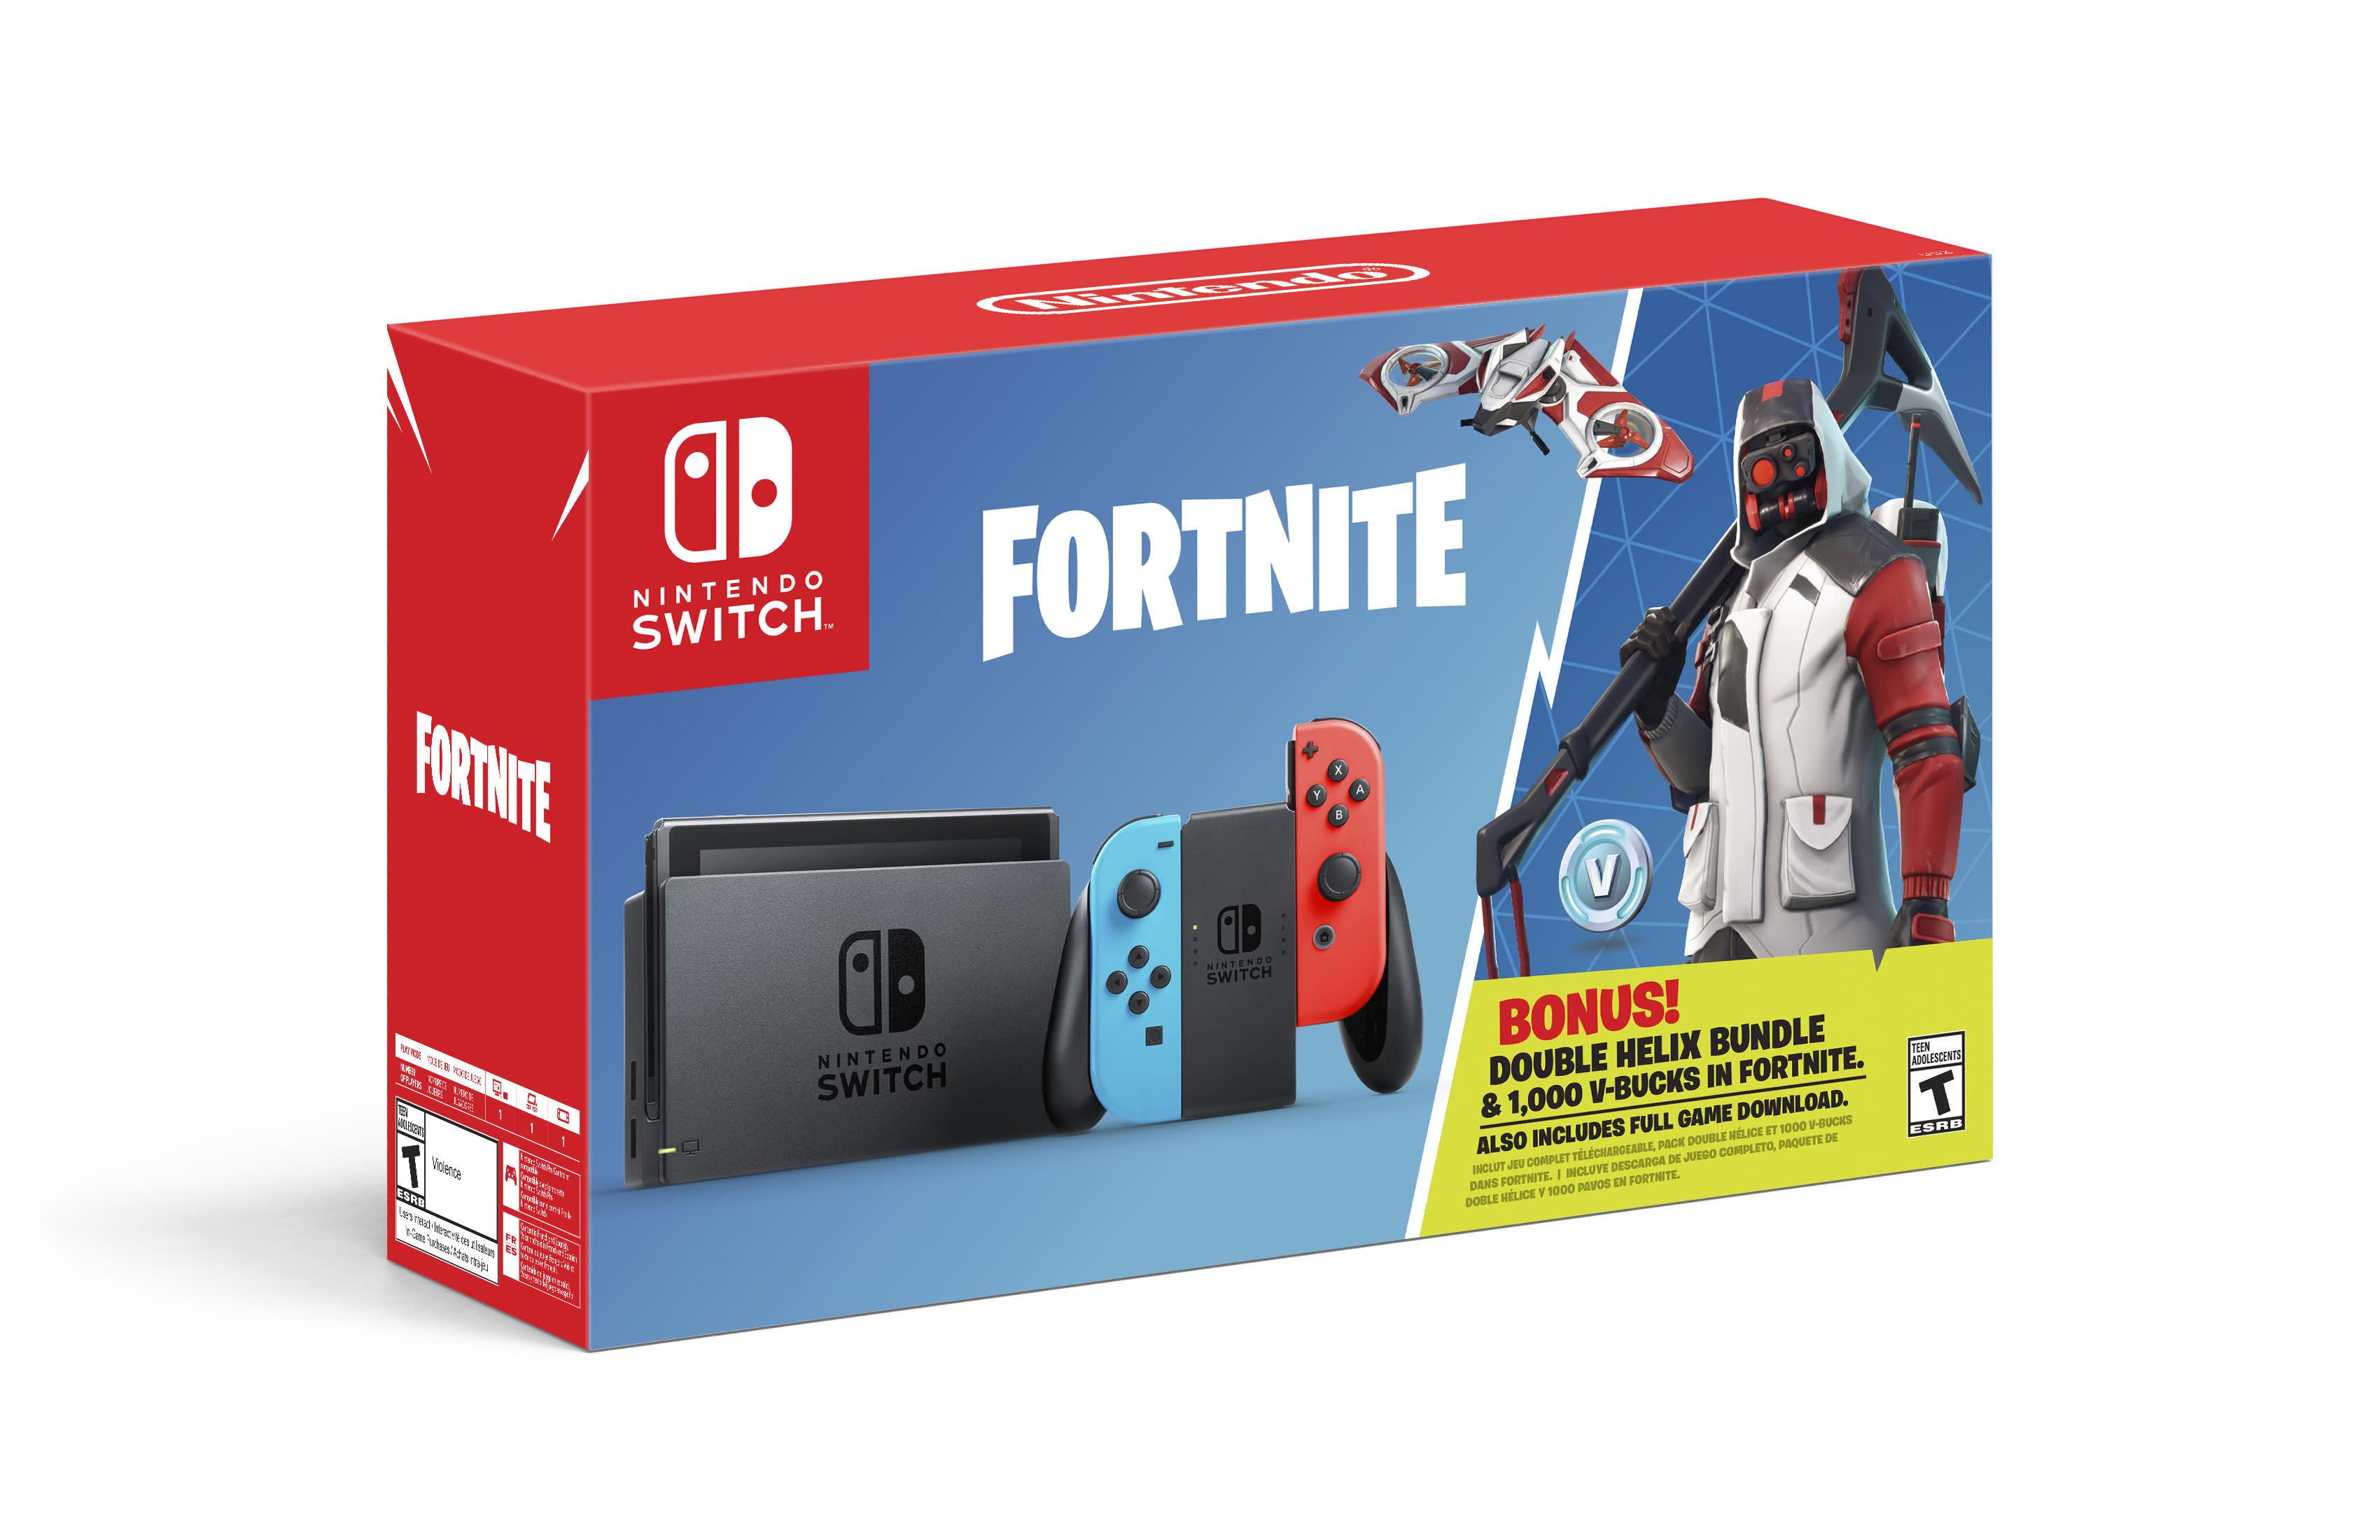 Nintendo Switch Fortnite Bundle Coming In October